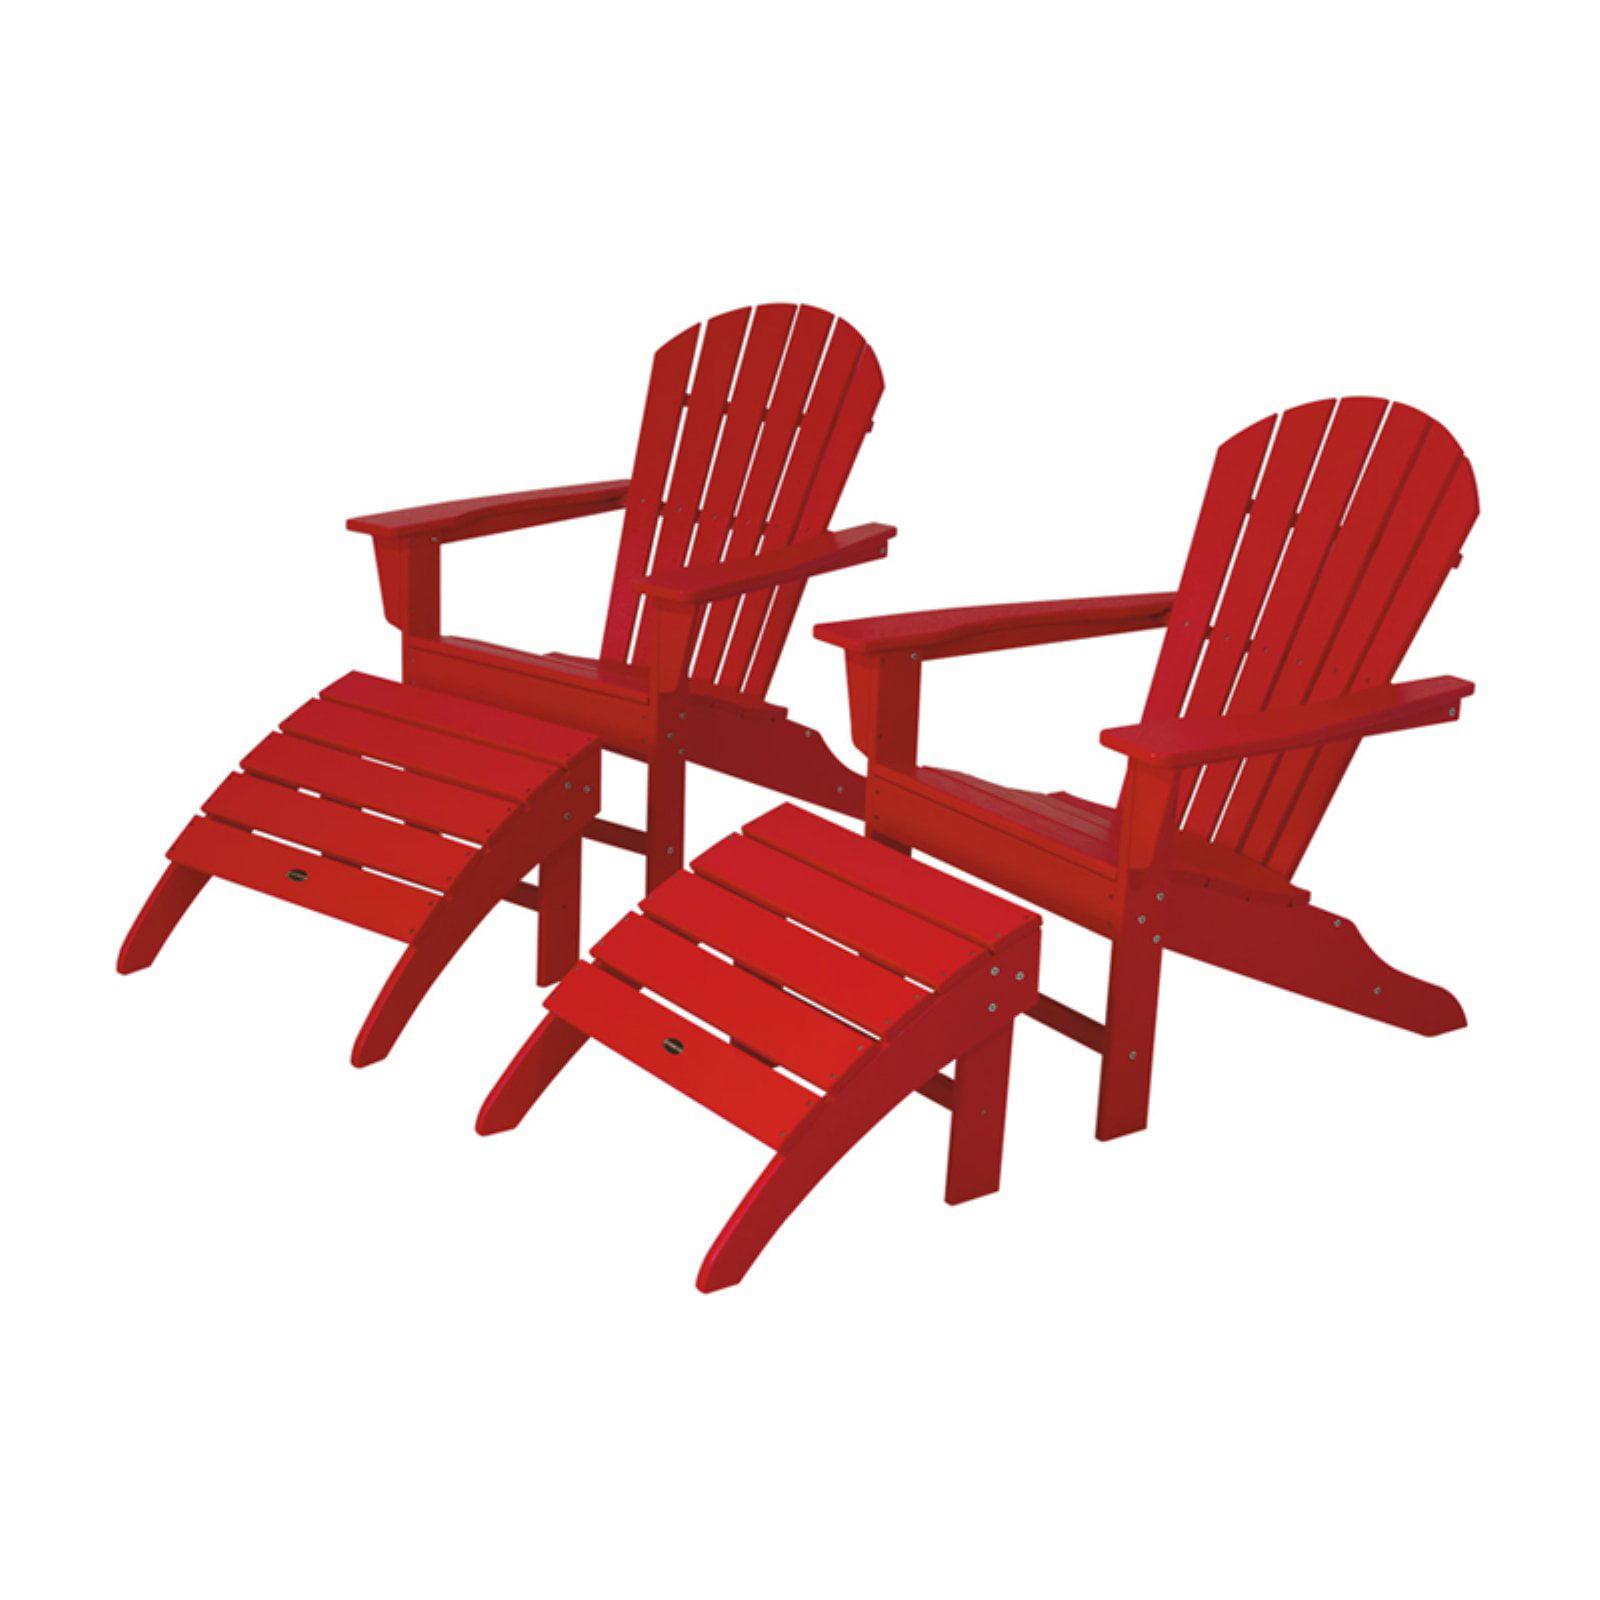 POLYWOOD® South Beach Recycled Plastic 4 pc. Adirondack Chair Set